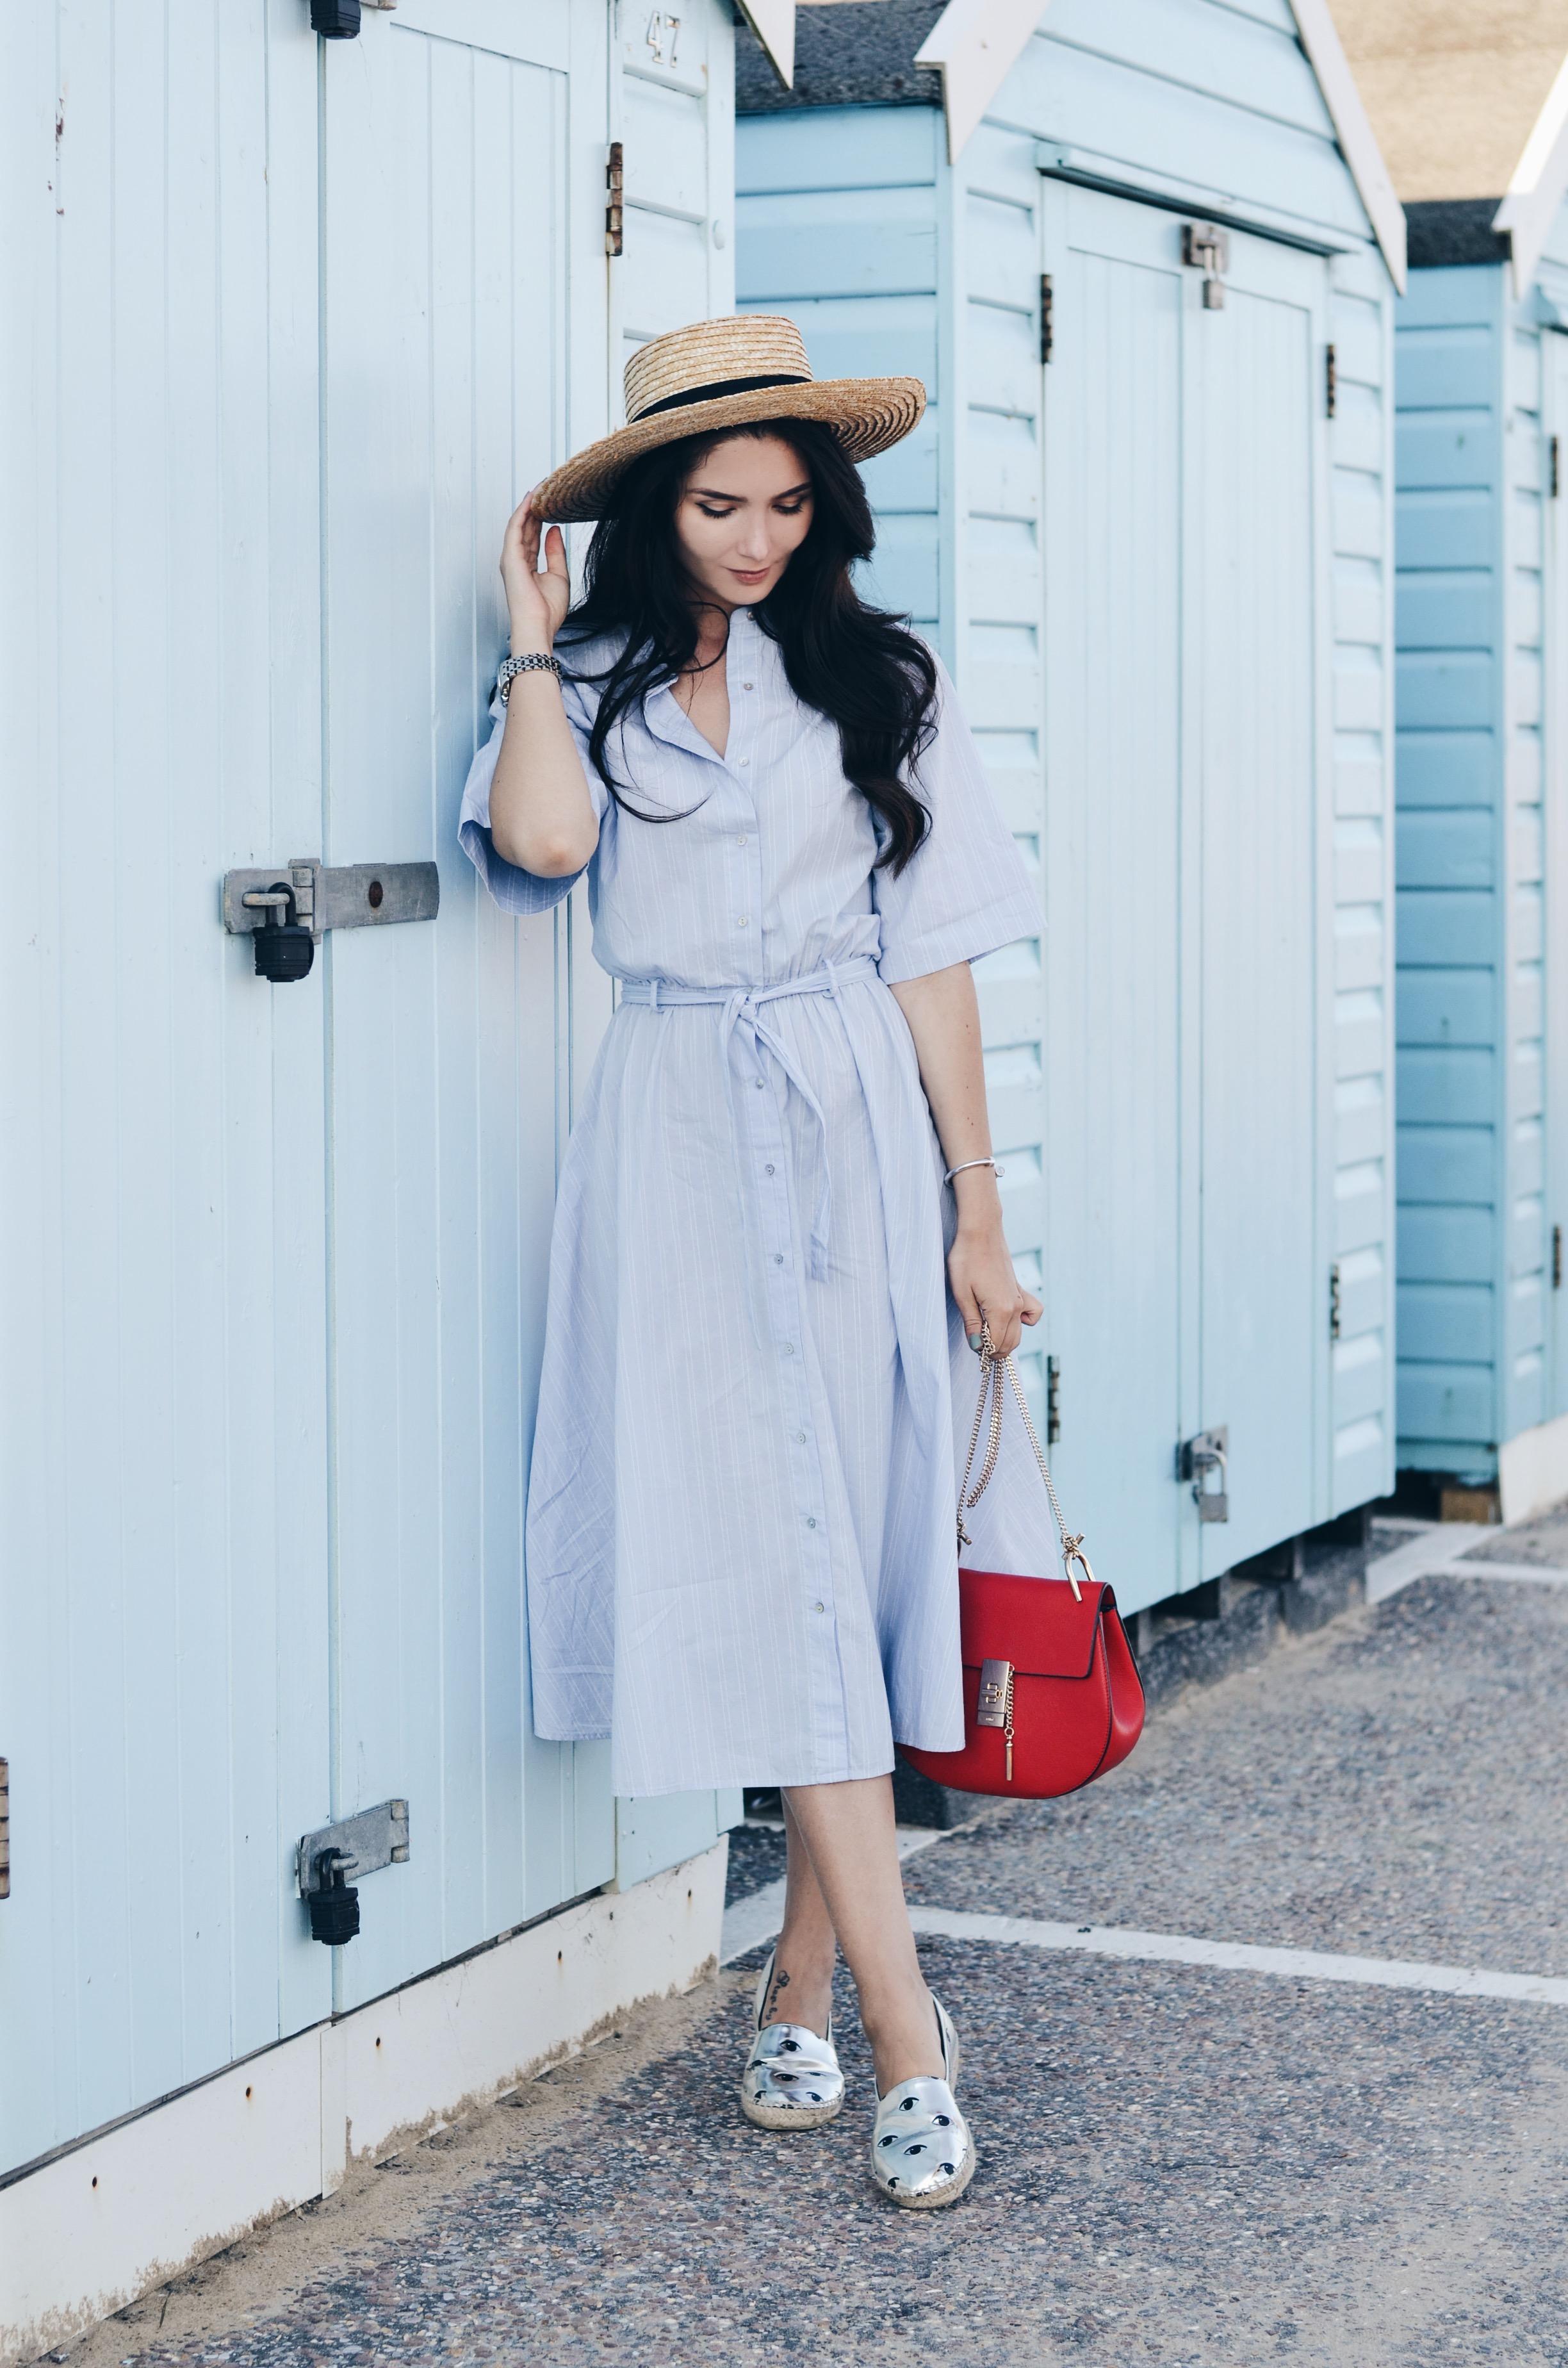 Dress: Zara | Bag; Chloe | Espadrilles: Kenzo* | Hat: H&M | Watch: Thomas Sabo | Bracelet: Tiffany&Co